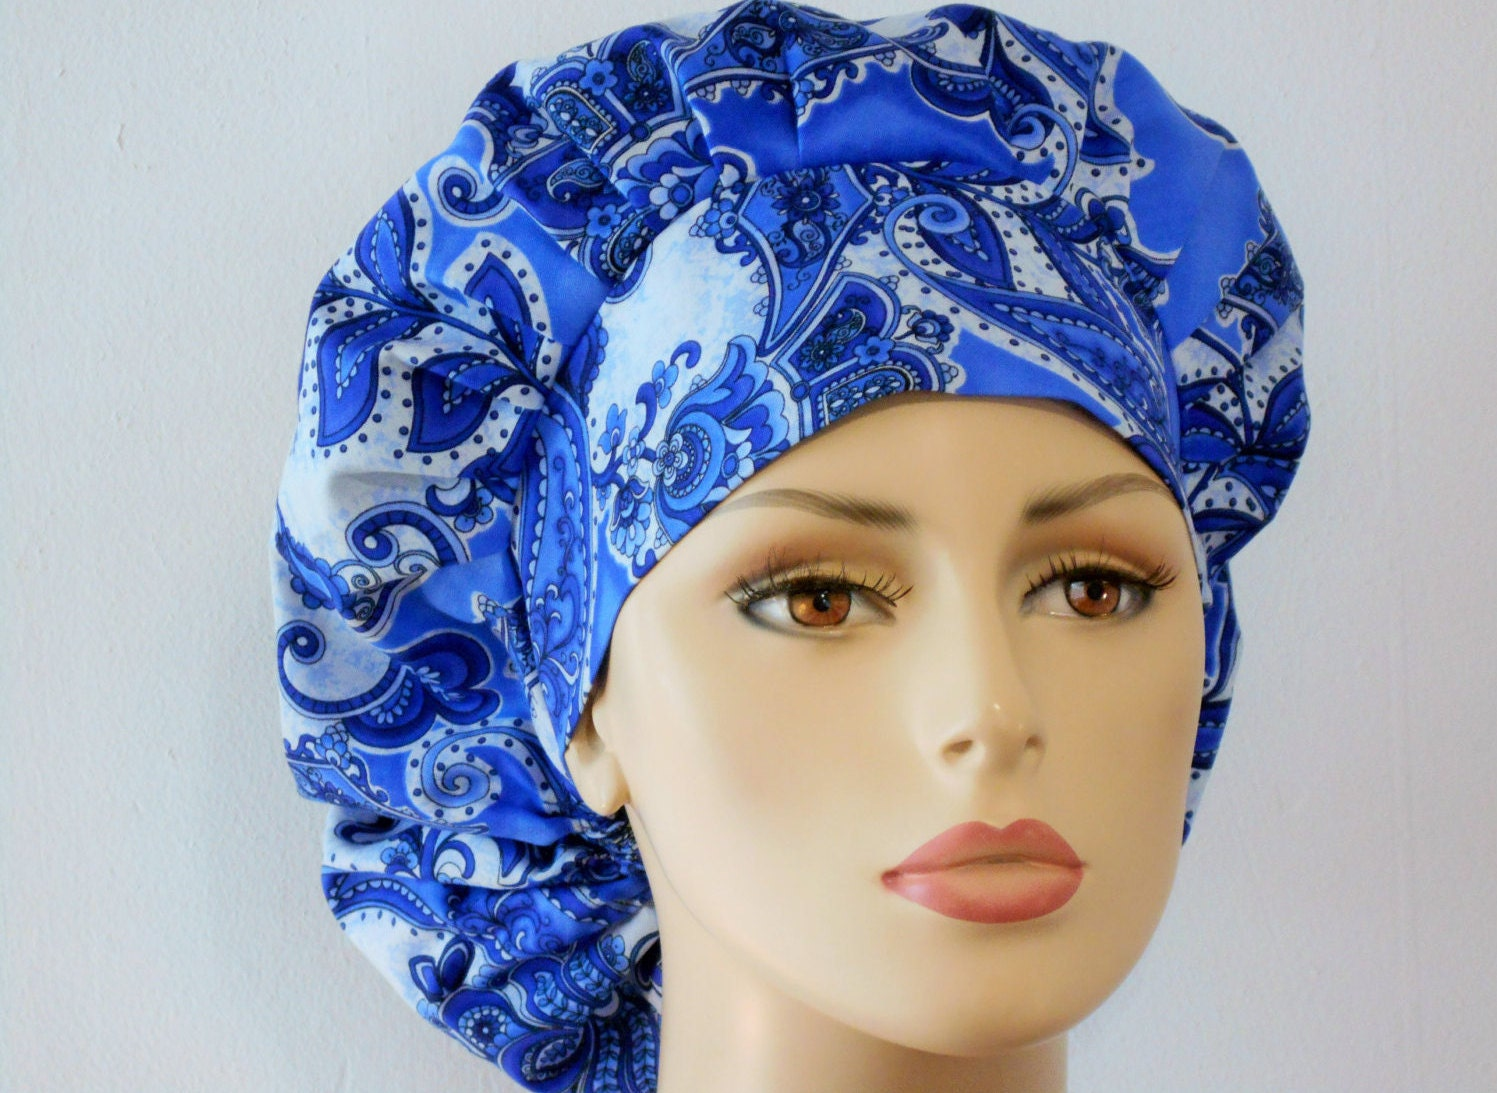 Bouffant Surgical Scrub Hat Kobalt Blue Majestic By Silvercaps